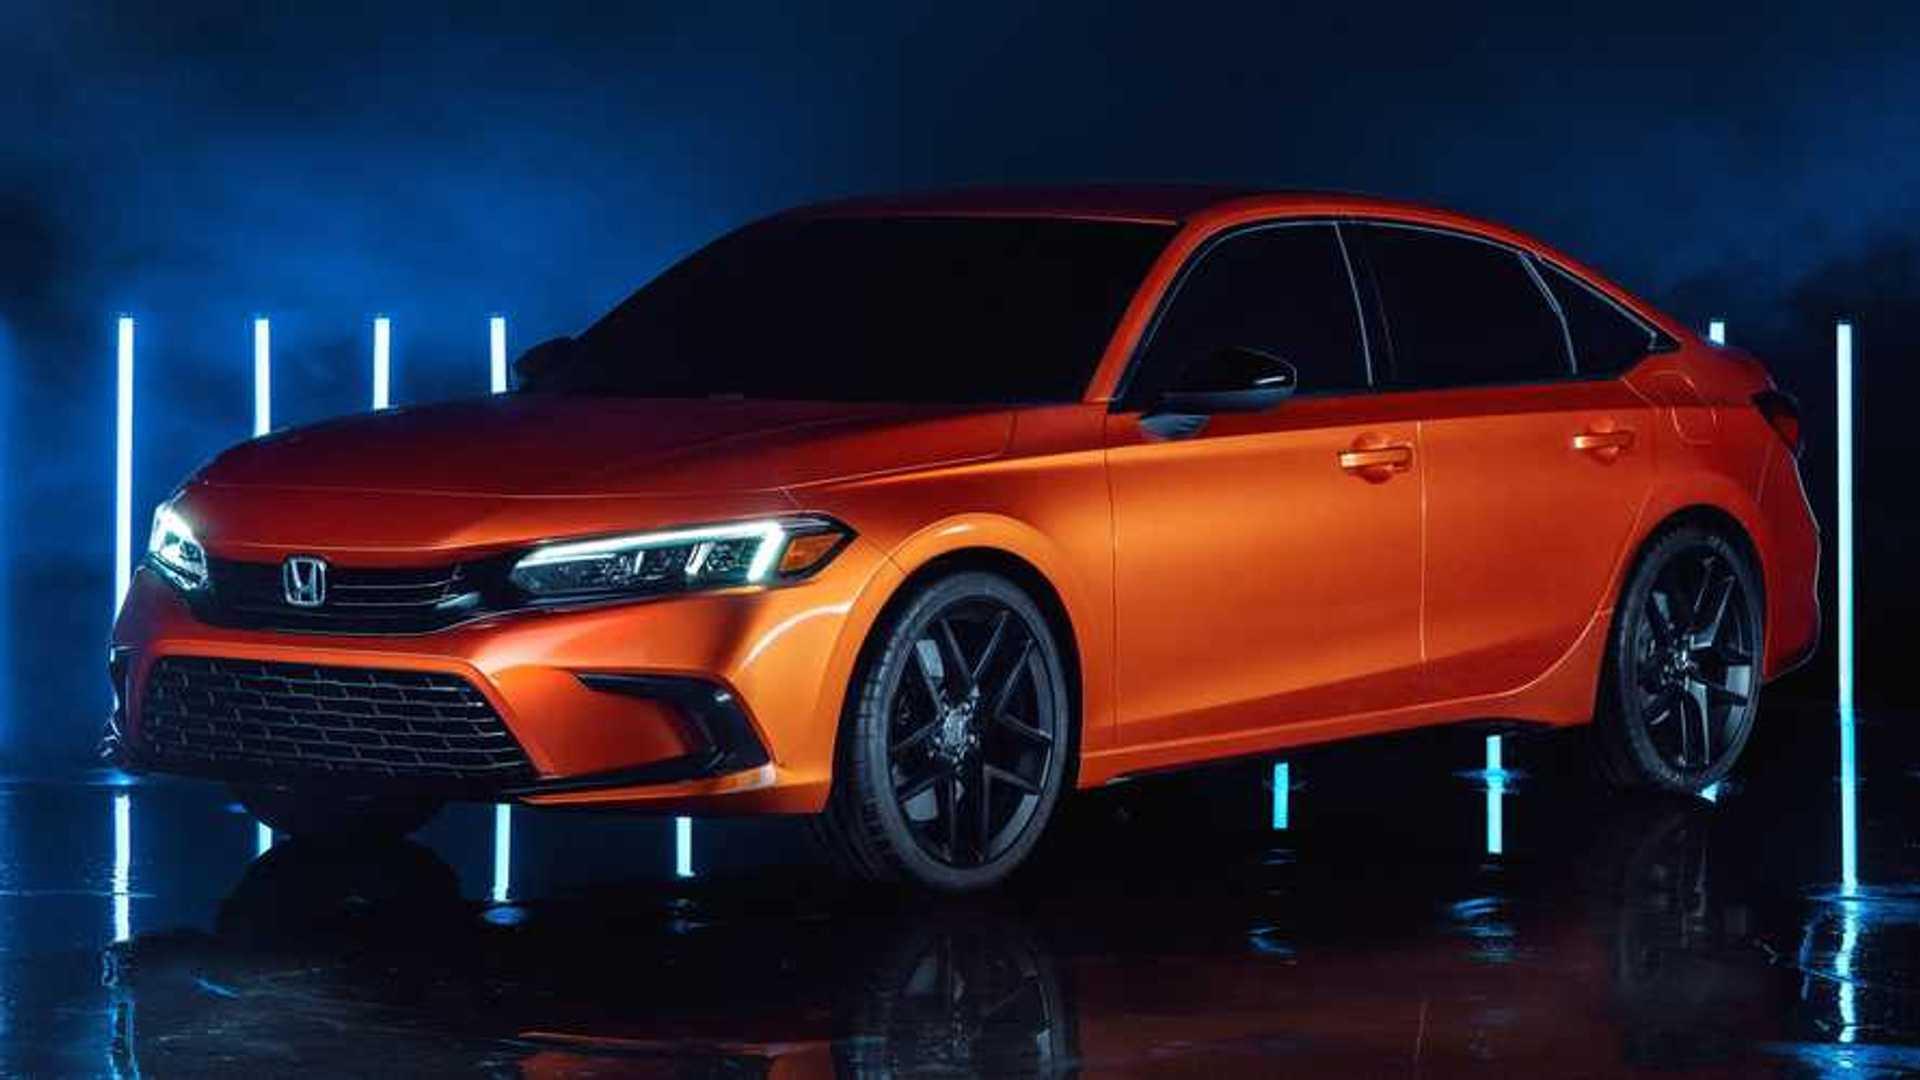 2022 Honda Civic Prototype: Bold Looks, Better Tech, More Safety